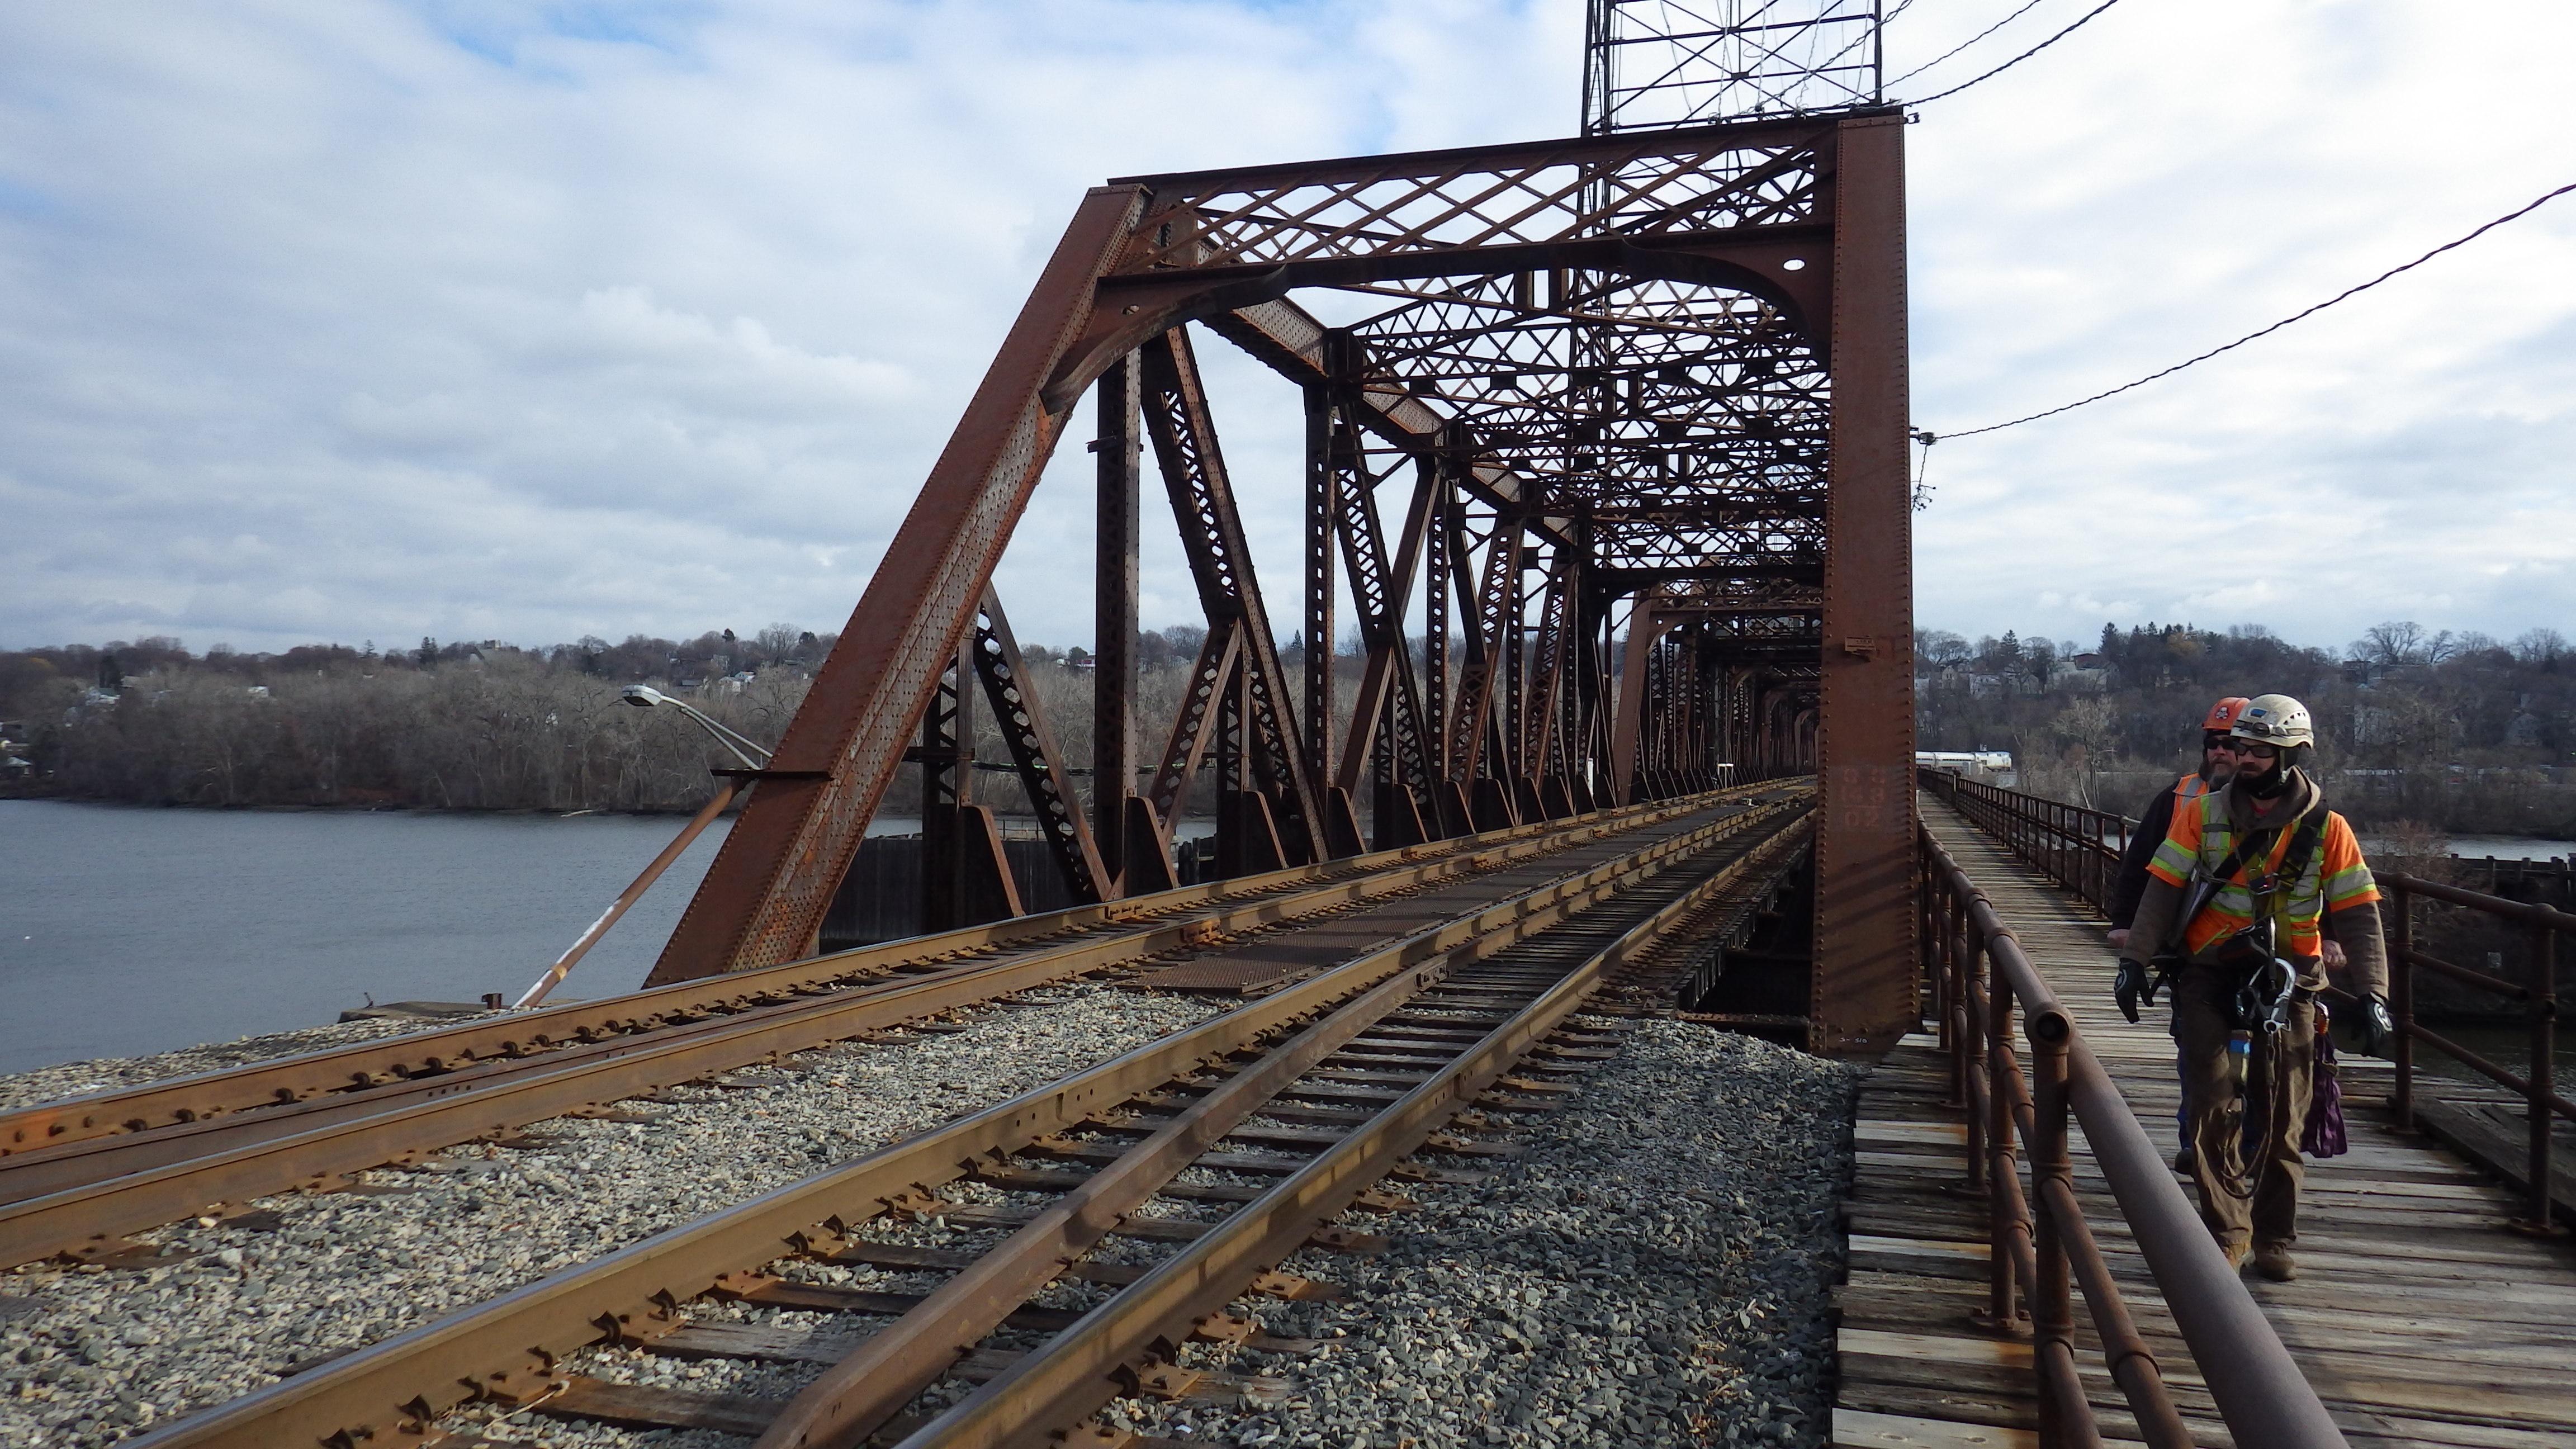 Modjeski And Masters Rehabs Railroad Swing Bridge